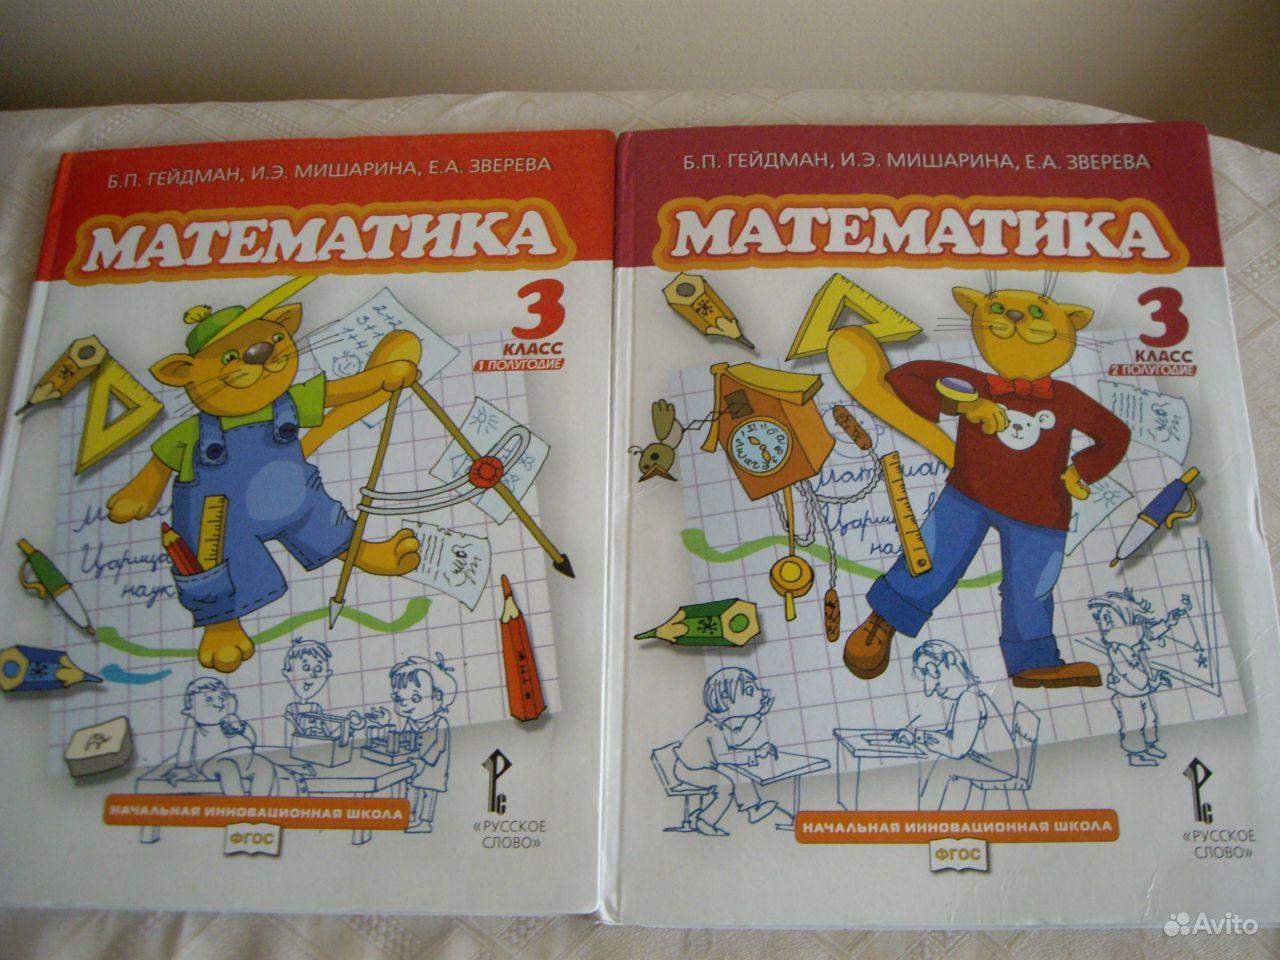 МАТЕМАТИКА 3 КЛАСС ГЕЙДМАН СКАЧАТЬ БЕСПЛАТНО